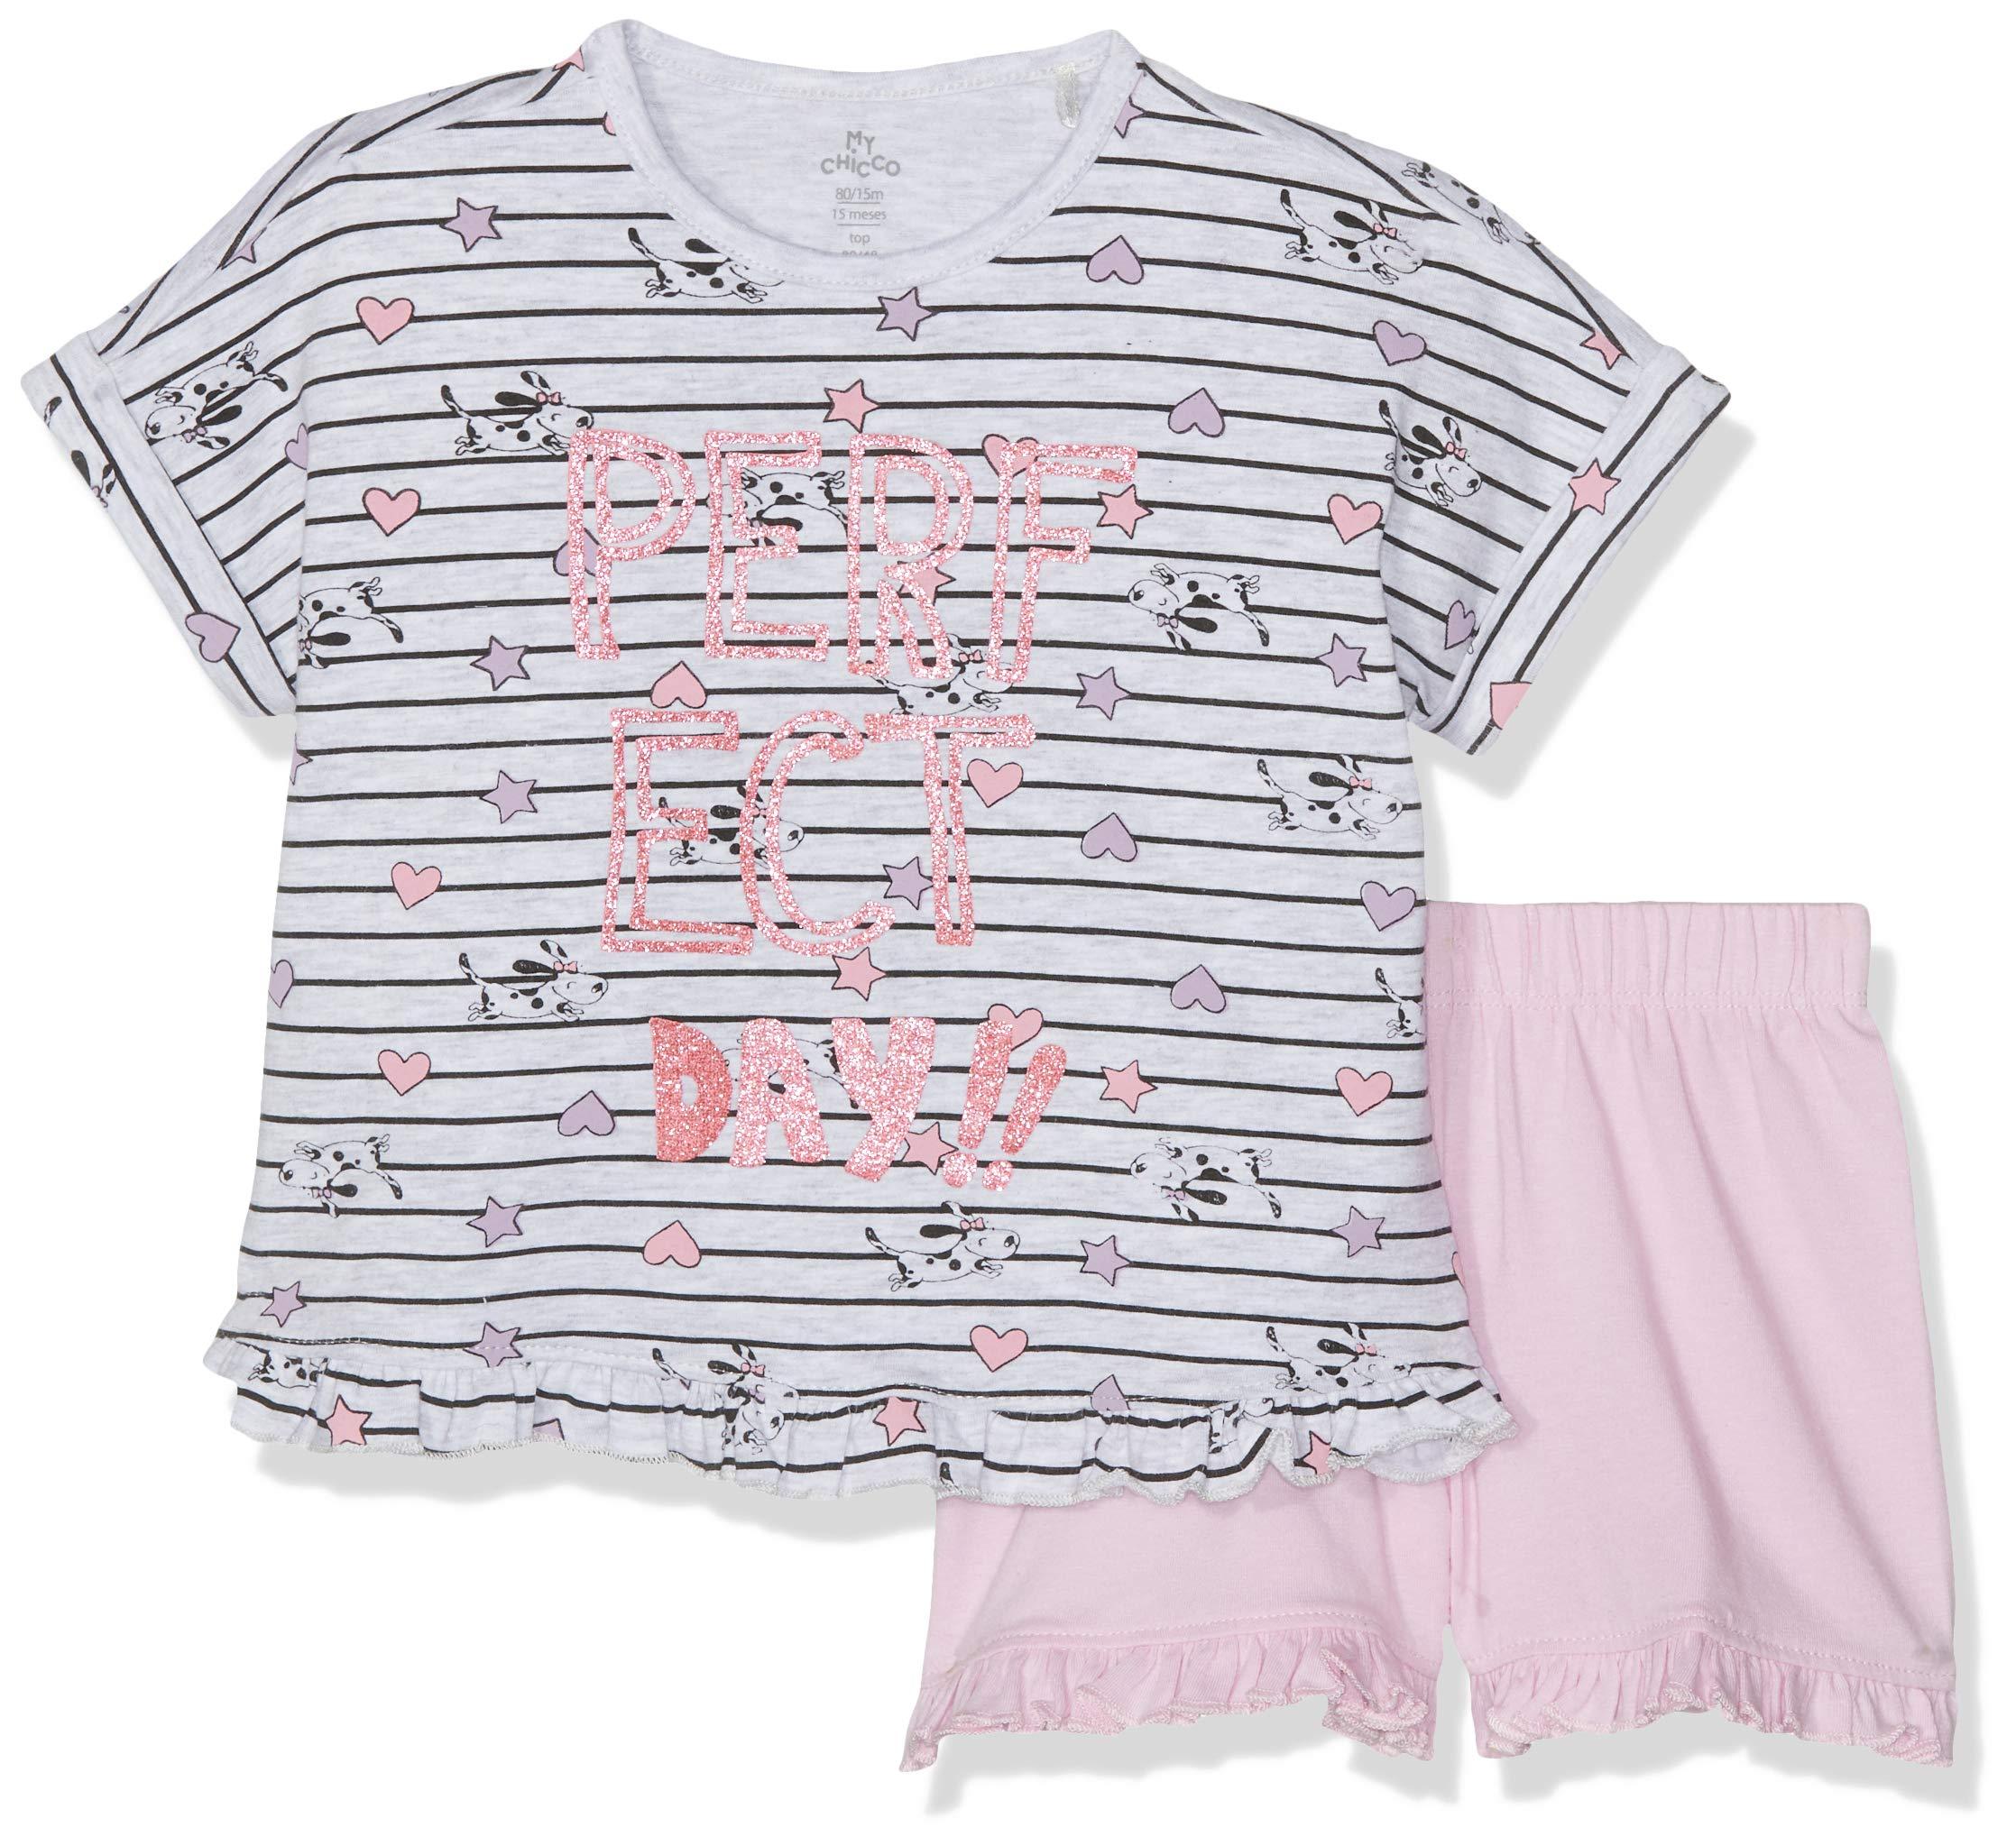 Chicco Pigiama Manica Corta Pijama para Bebés 1